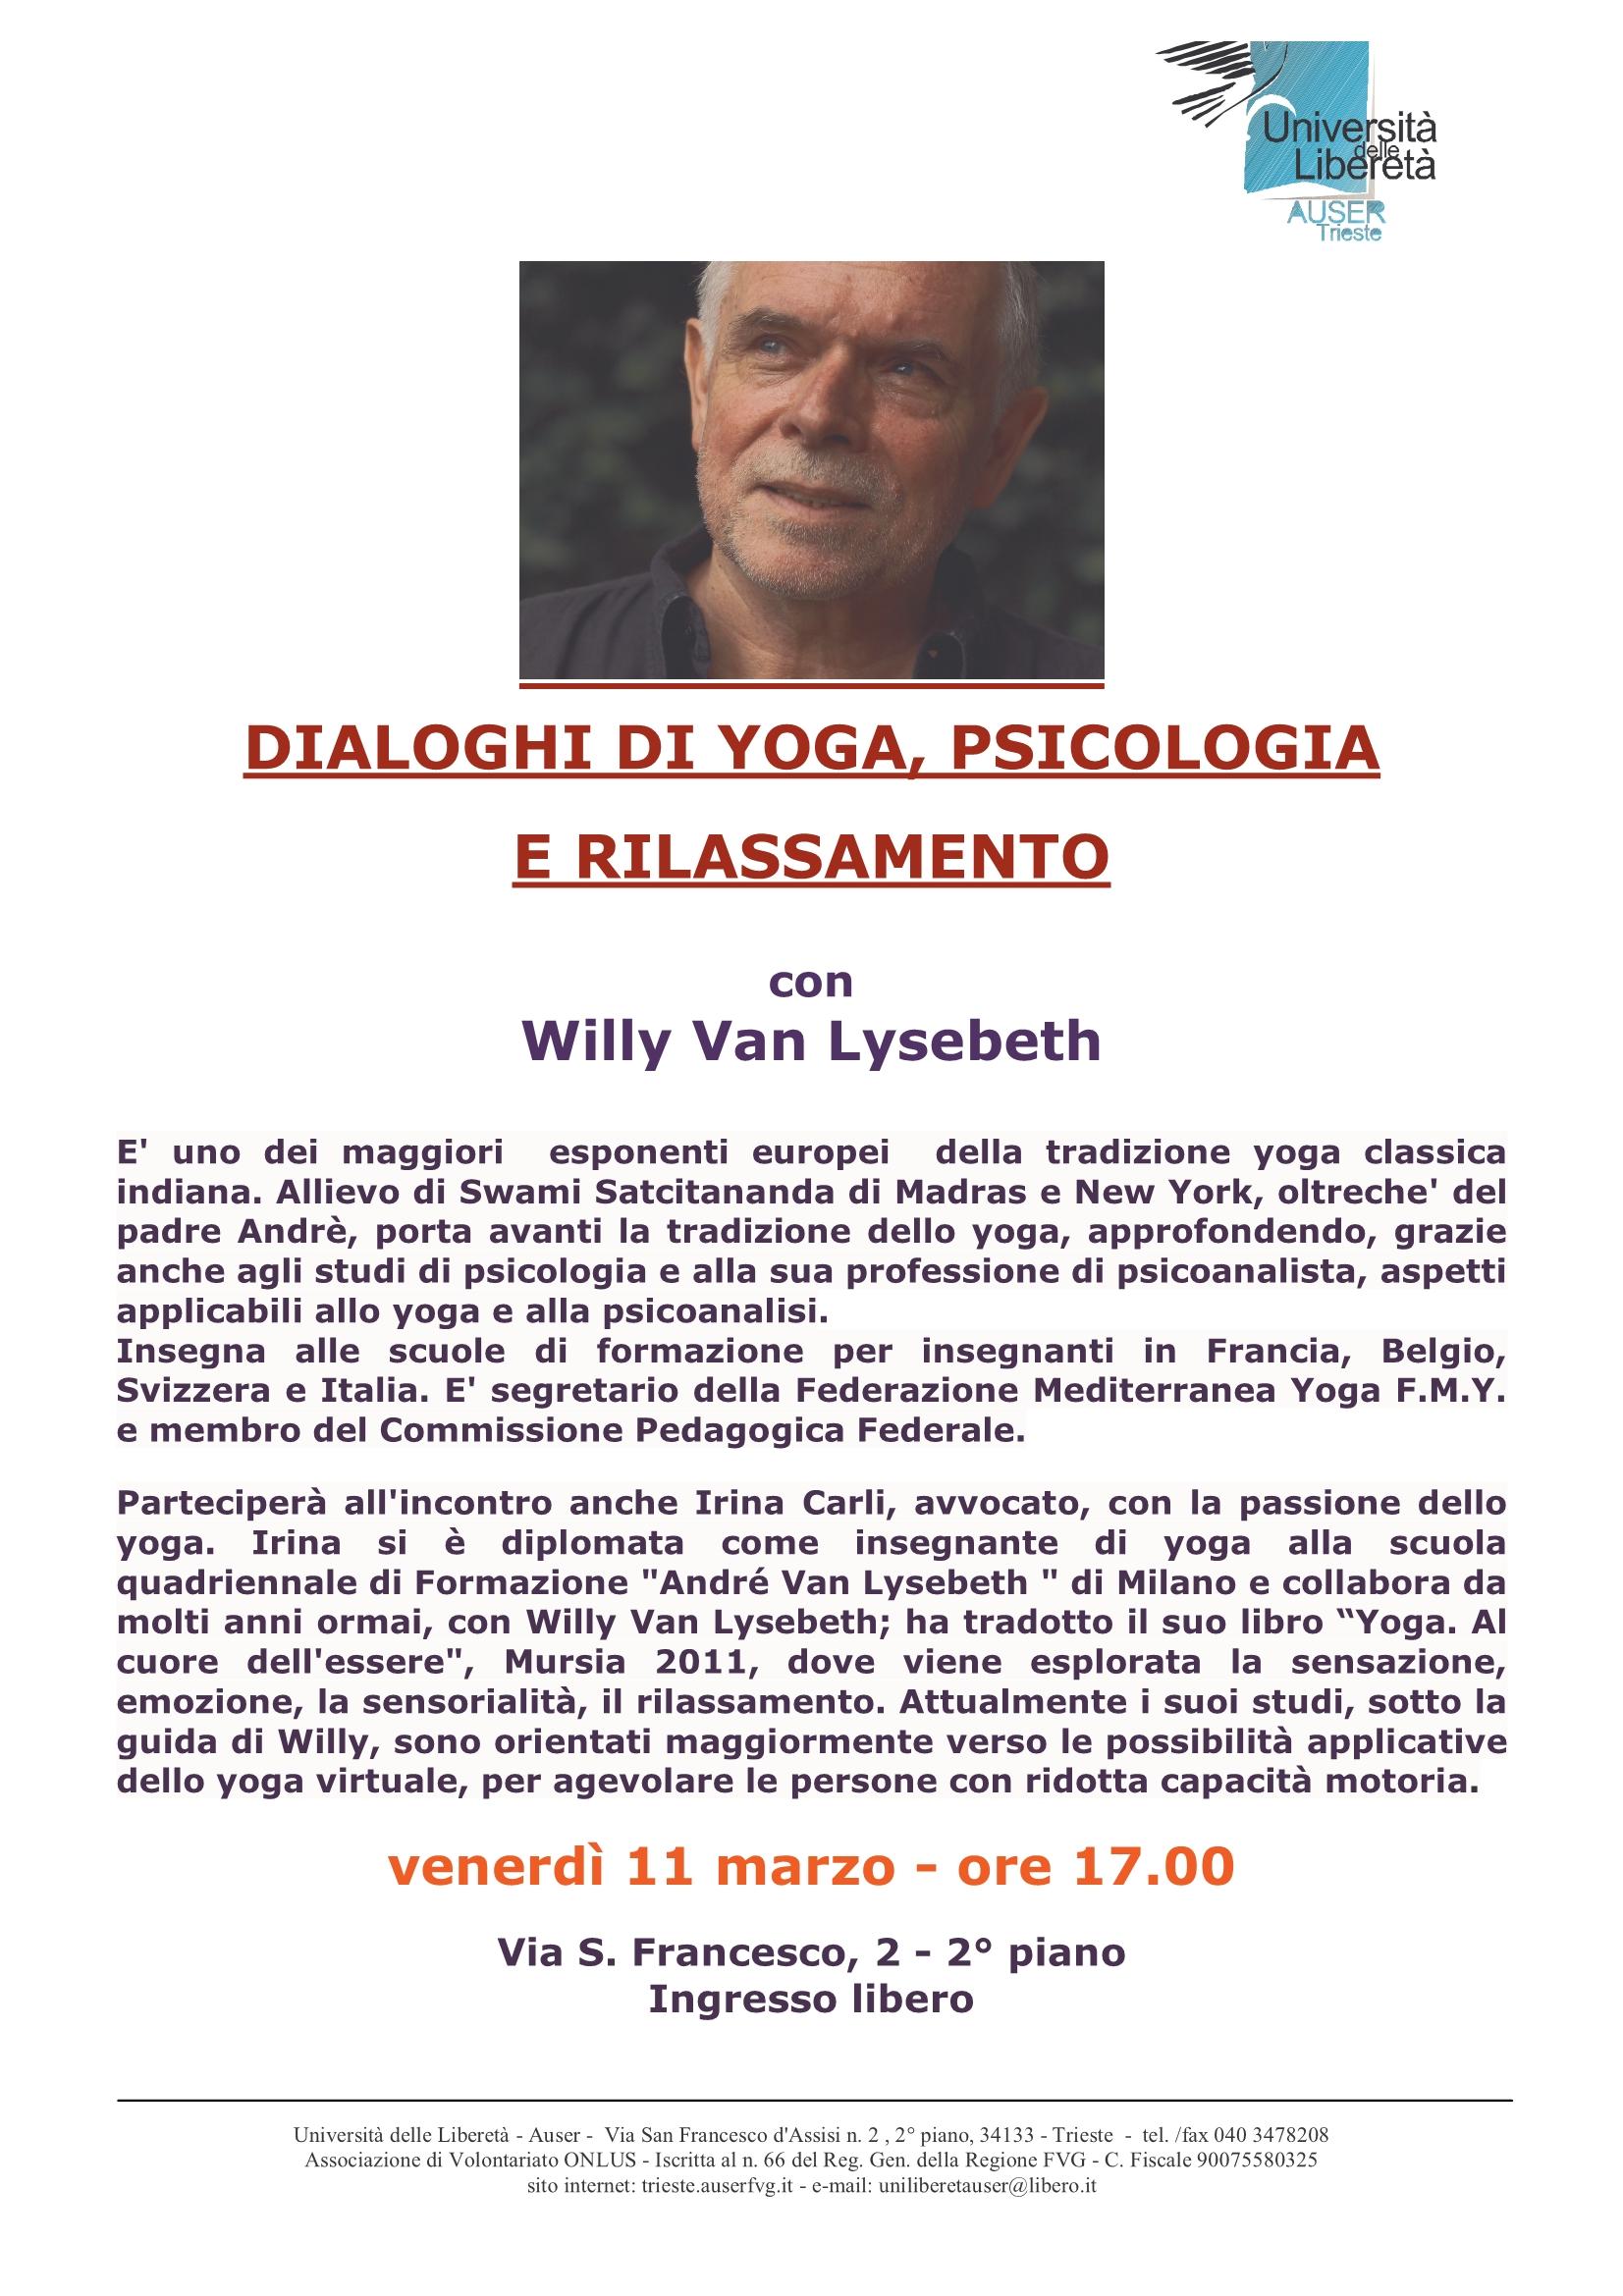 Locandina Willy Van Lysebeth